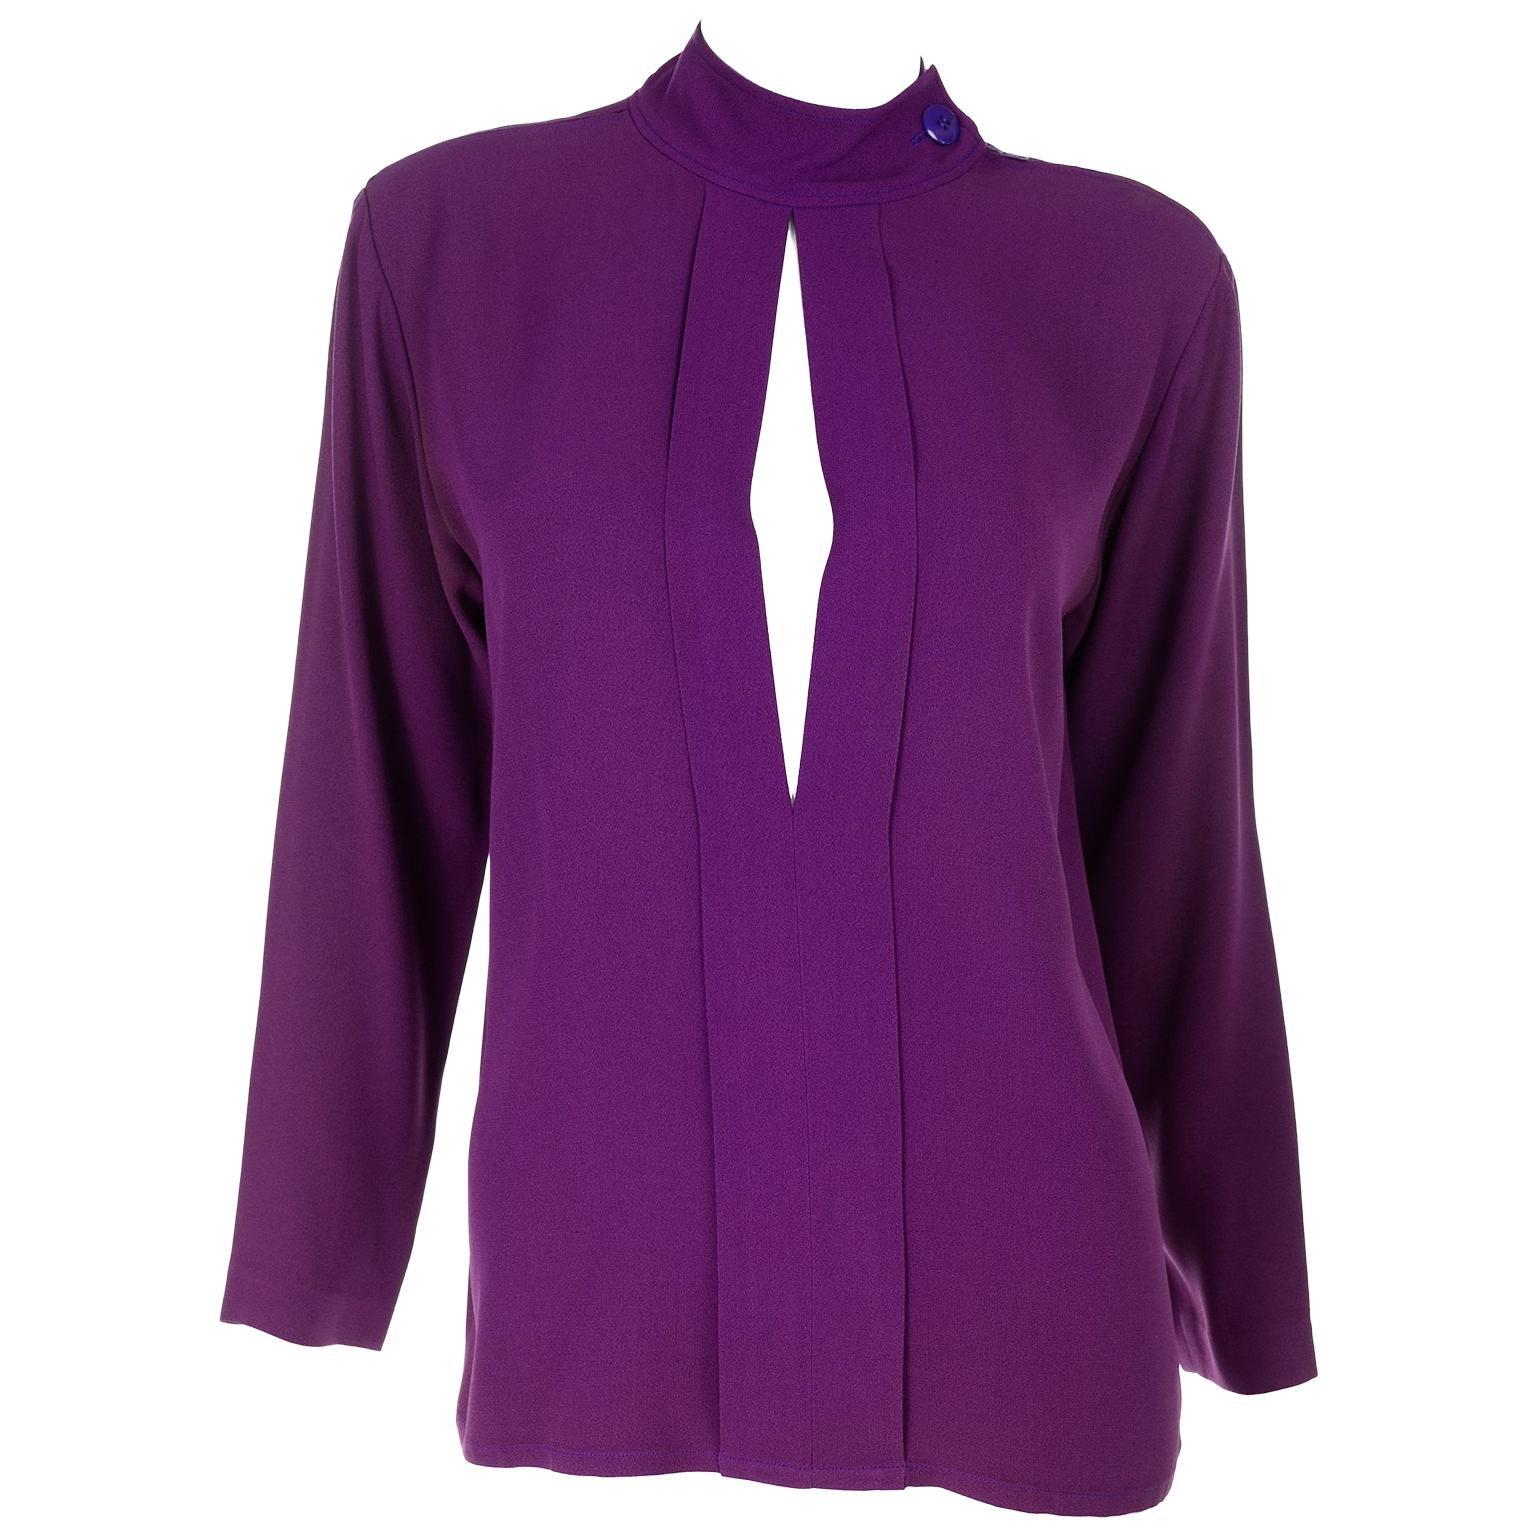 Yves Saint Laurent Vintage Purple Silk Crepe Top With Peek a Boo Cutout